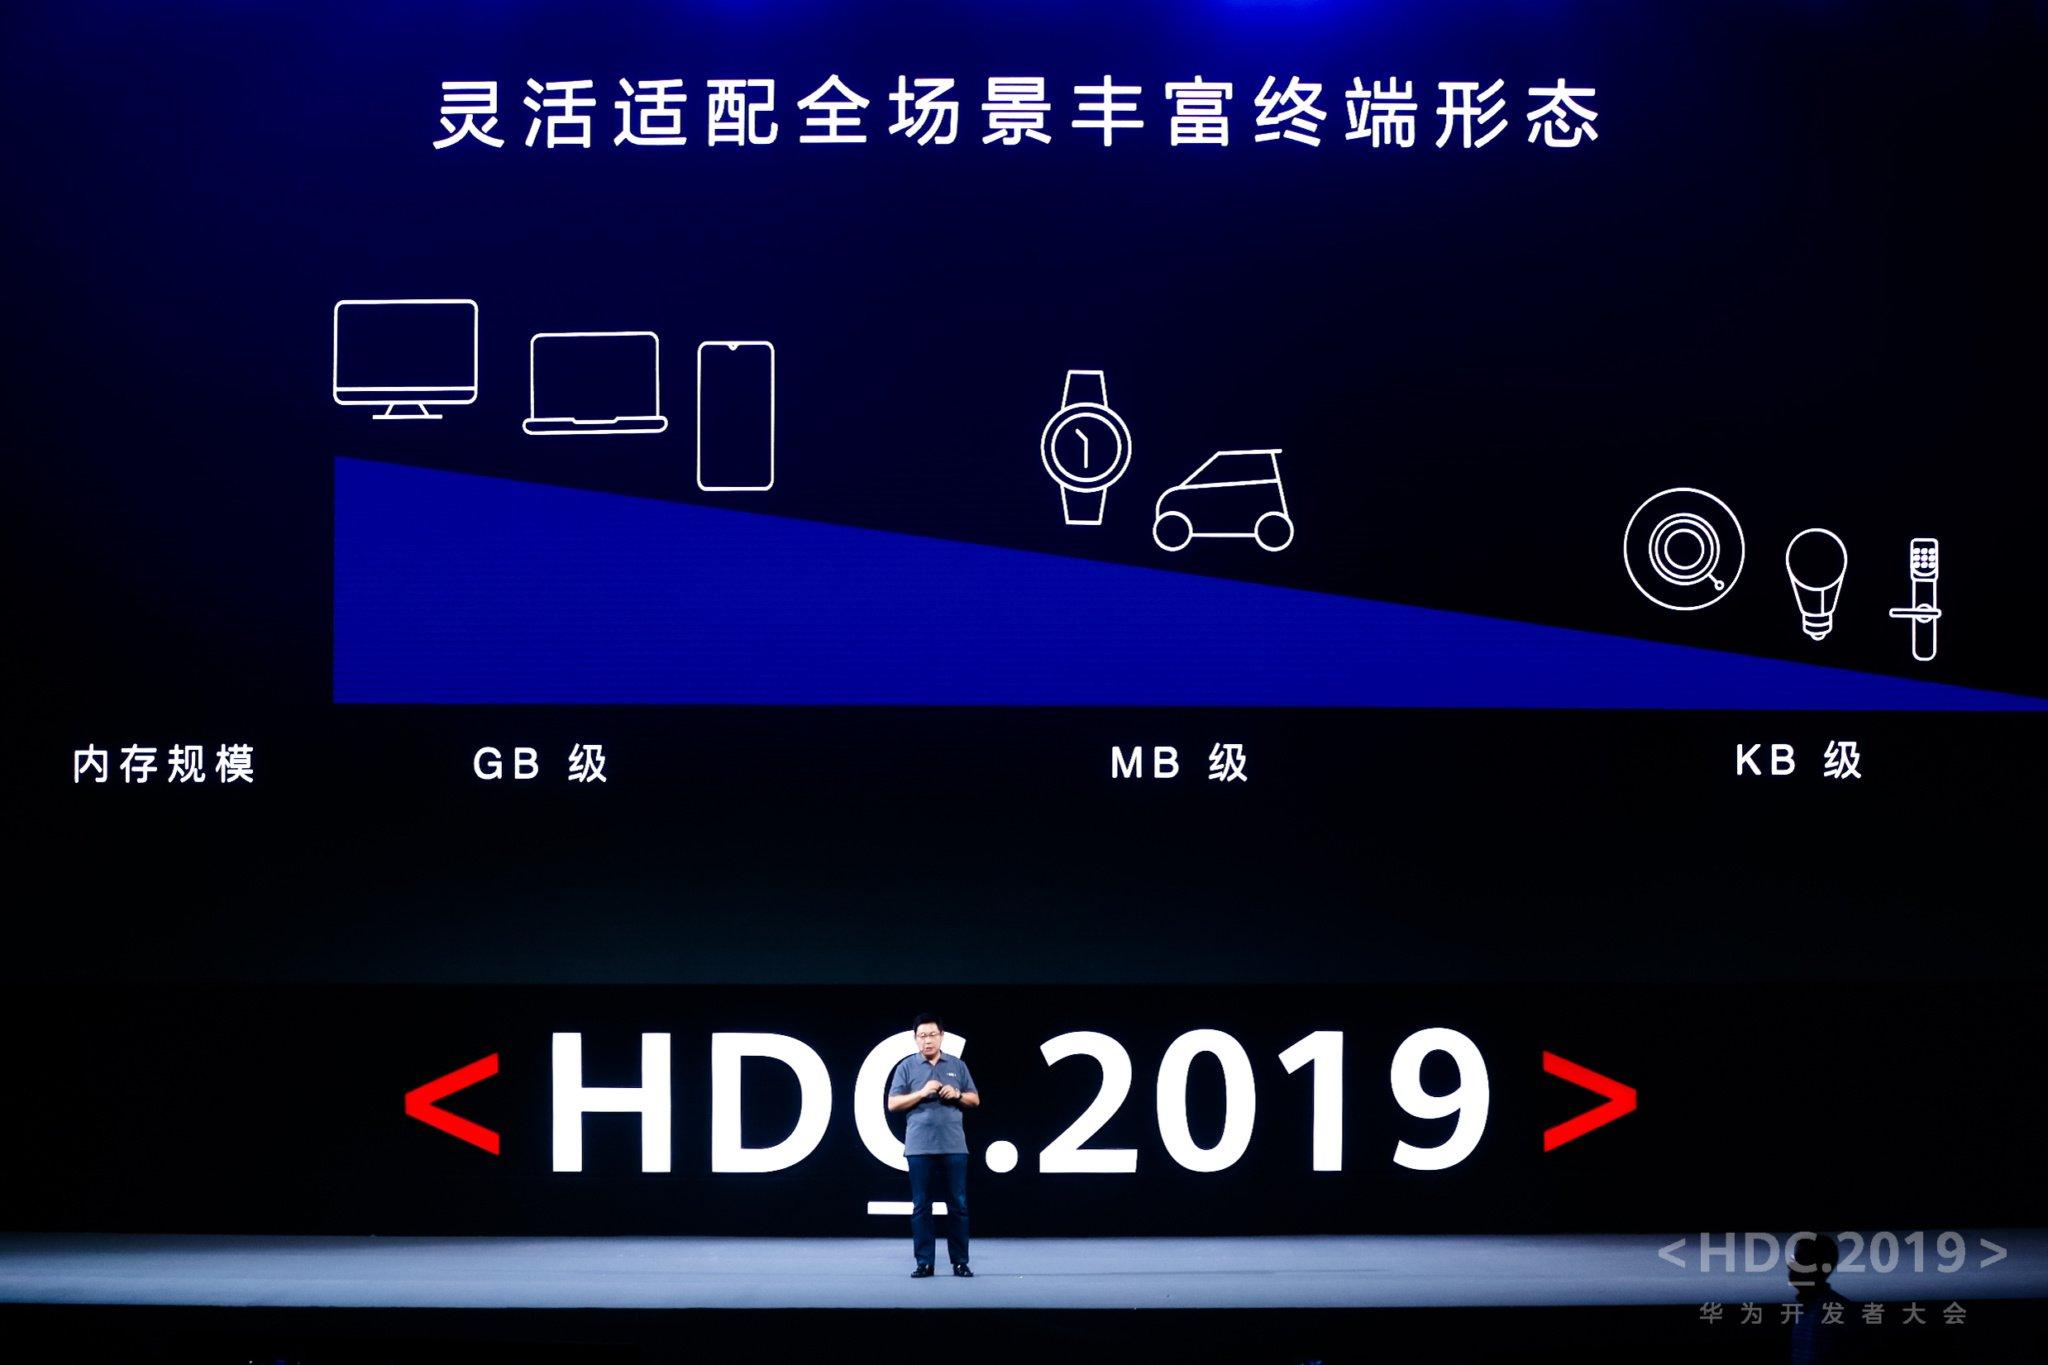 Huawei Yeni İşletim Sistemi HarmonyOS'u Tanıttı